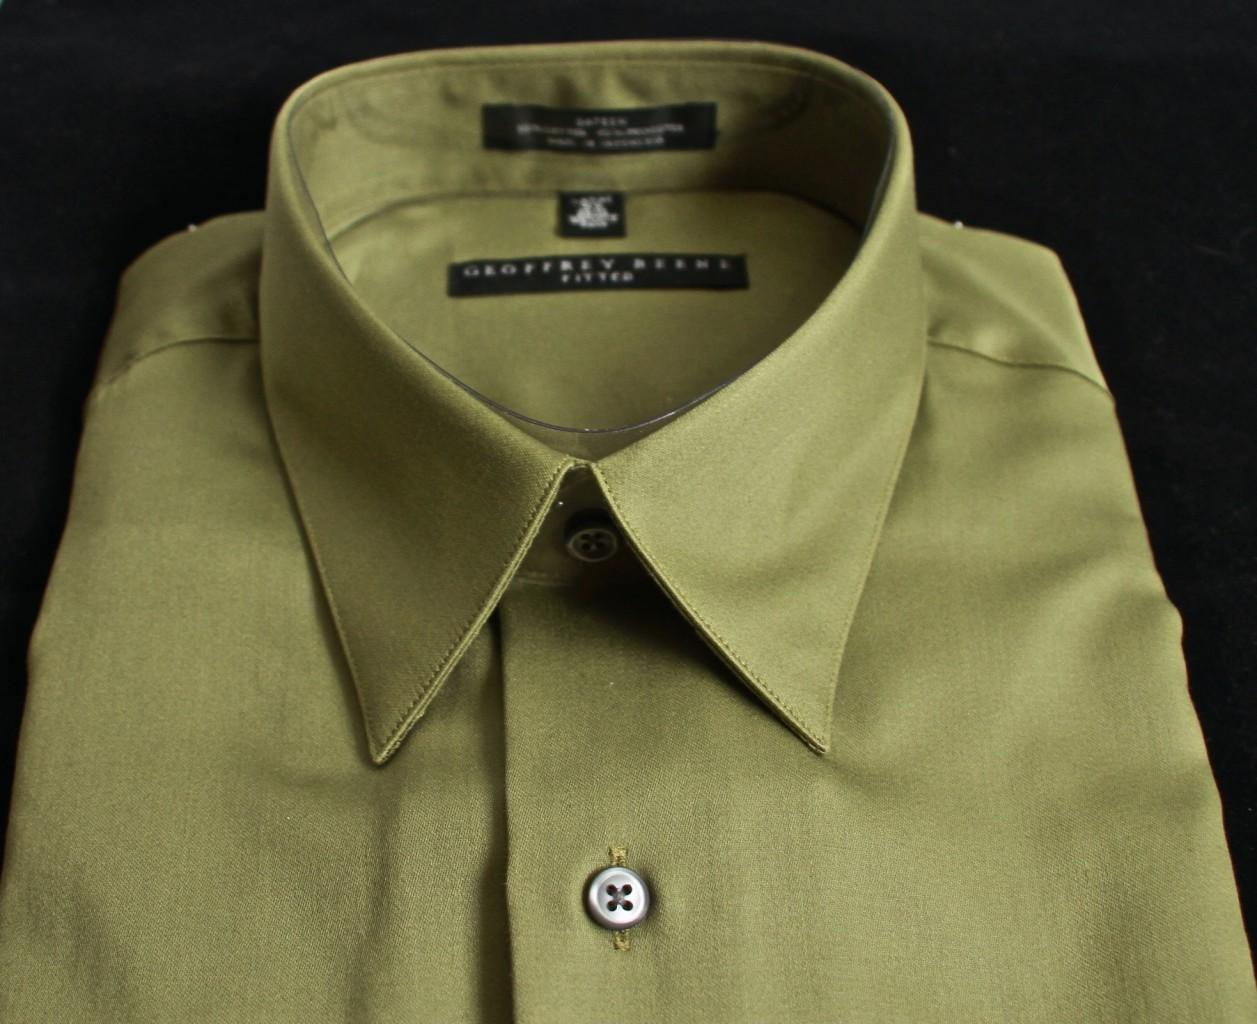 Zhantra108 Geoffrey Beene Dress Shirt Olive Green Sateen